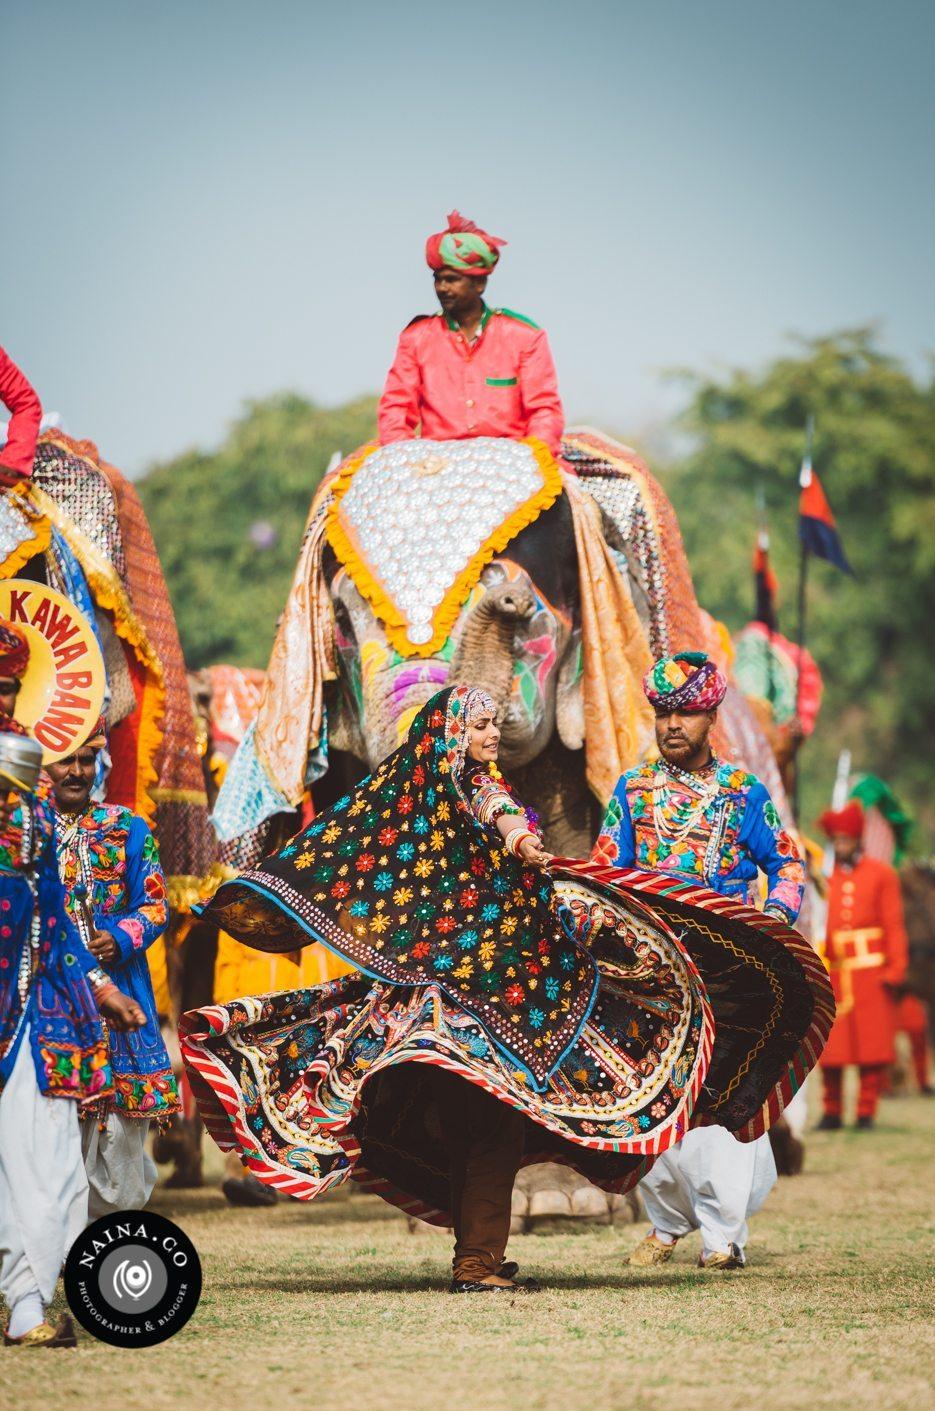 Naina.co-Raconteuse-Visuelle-Photographer-Blogger-Storyteller-Luxury-Lifestyle-January-2015-St.Regis-Polo-Cup-Maharaja-Jaipur-EyesForStreetStyle-07